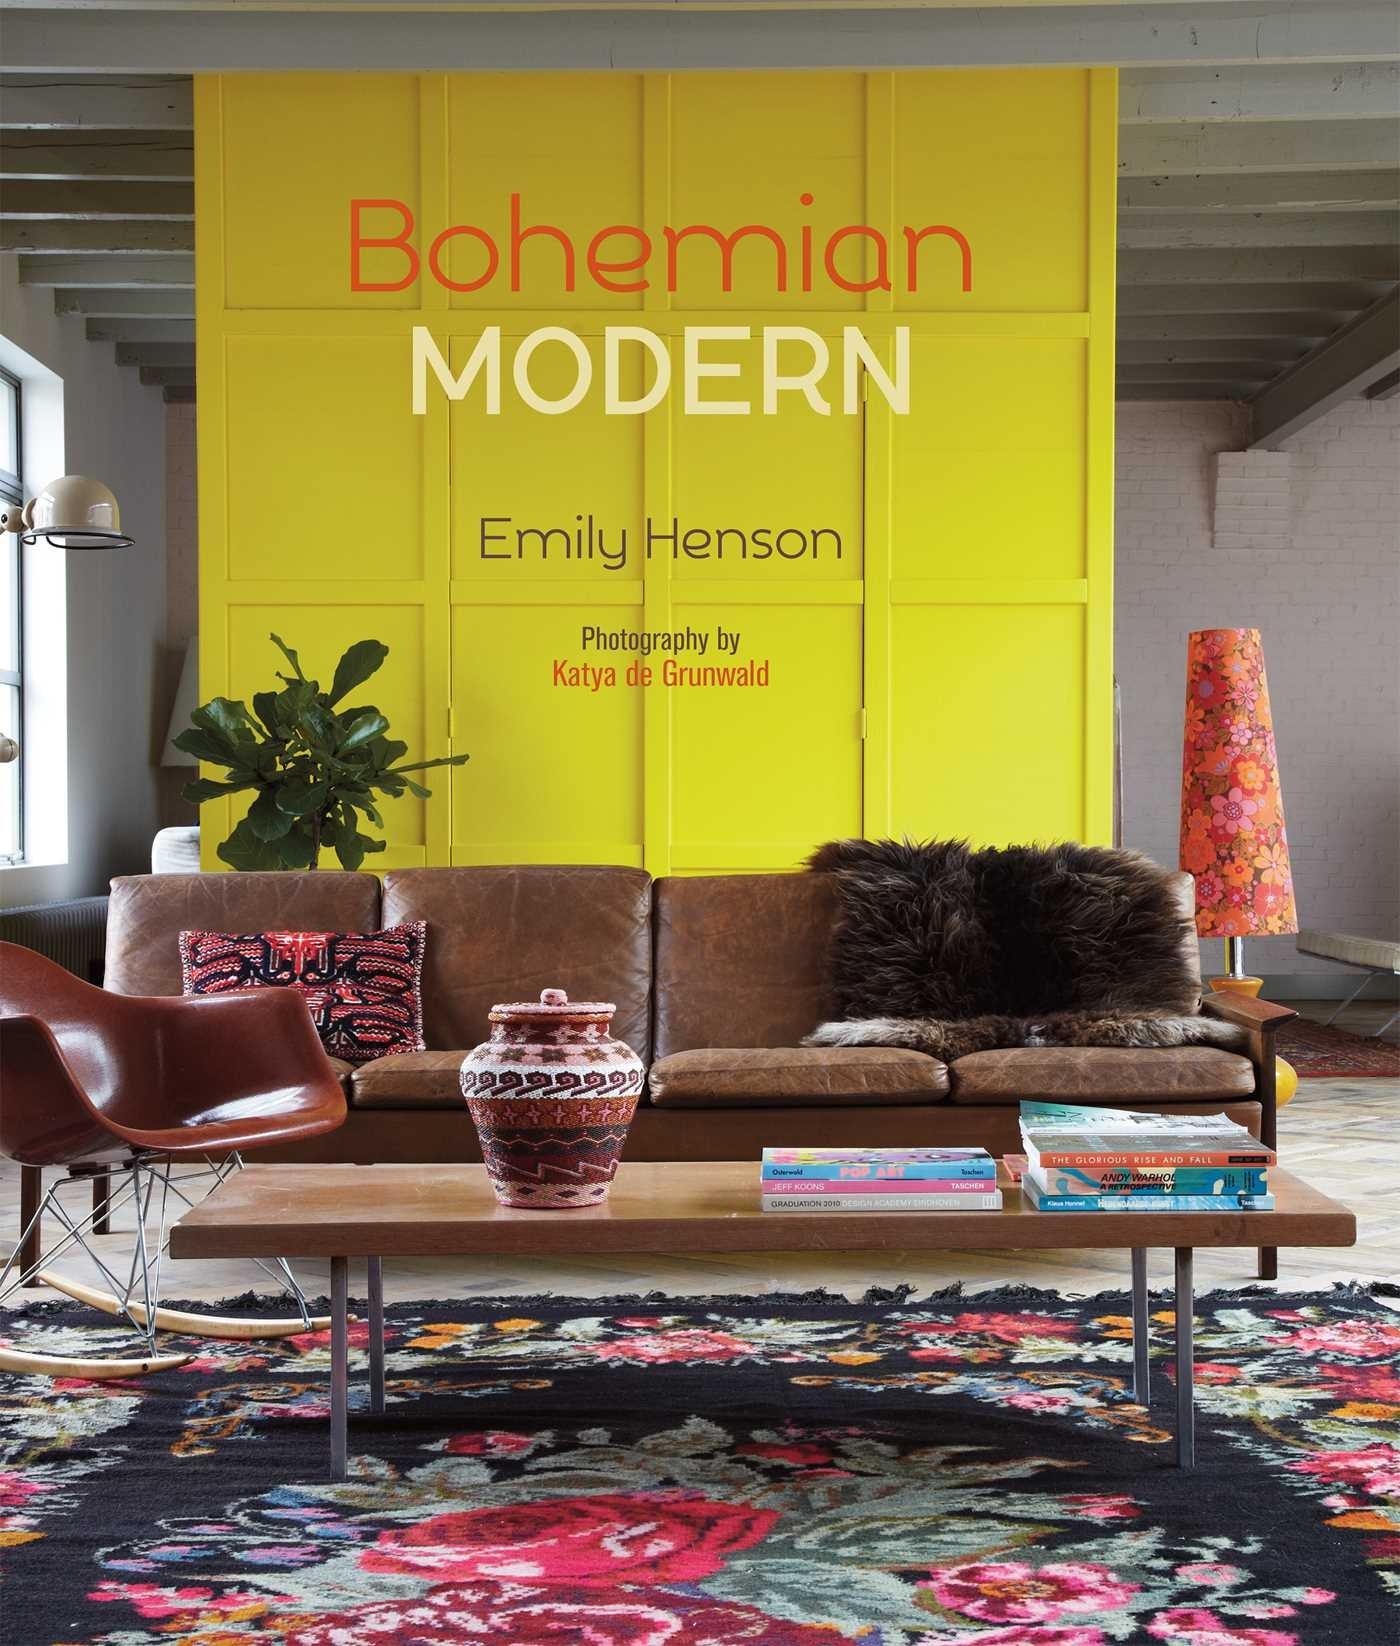 Bohemian Modern Imaginative And Affordable Ideas For A Creative - Bohemian interior design ideas